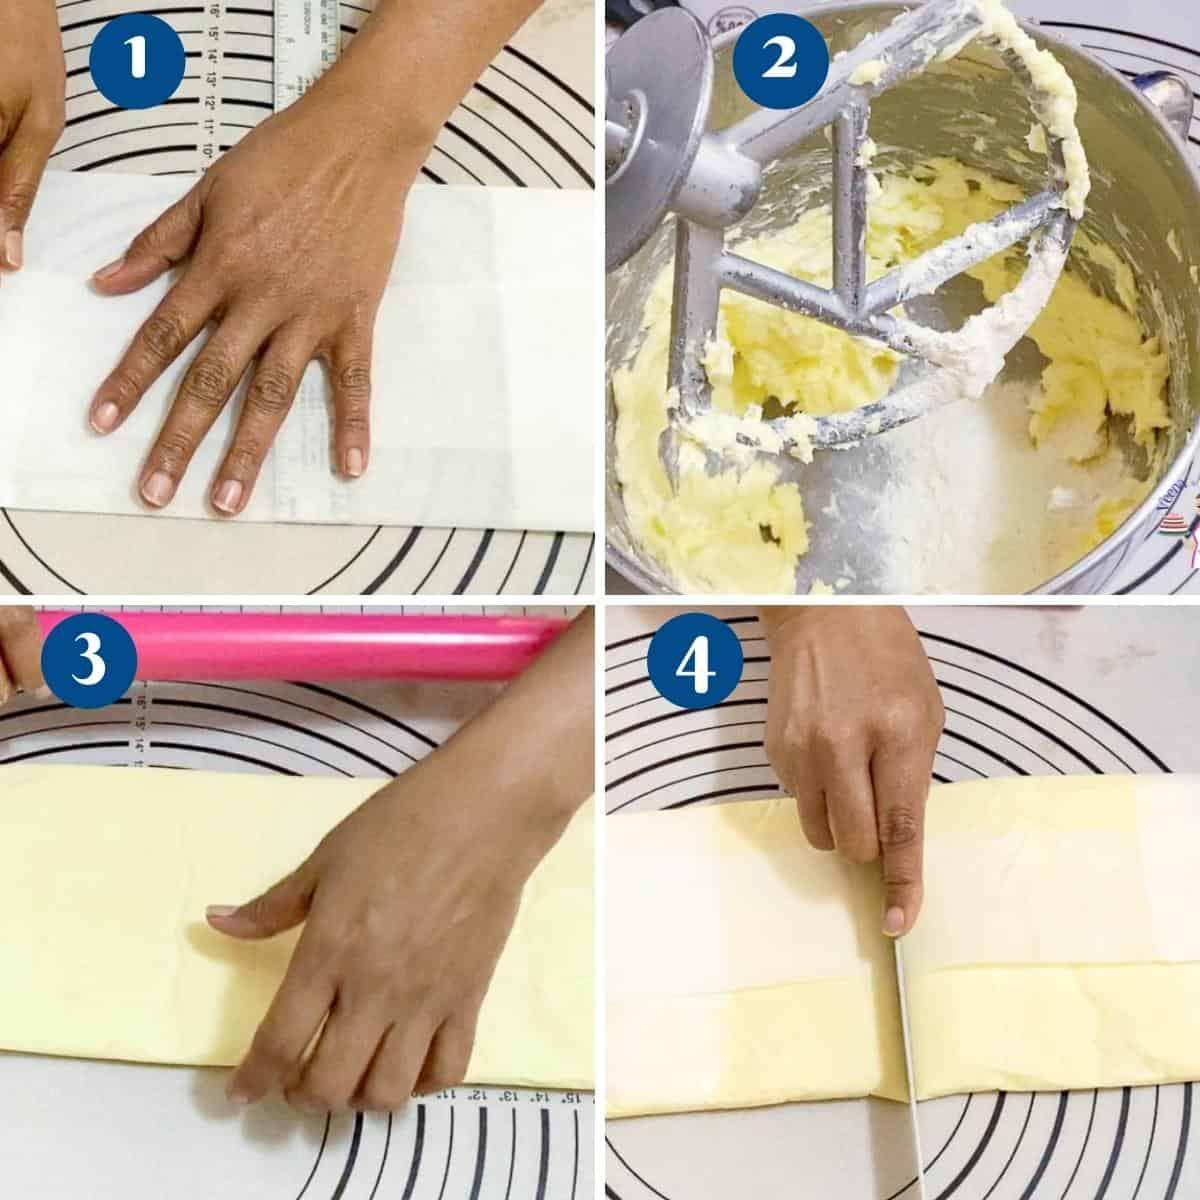 Progress Pictures preparing the butter block for Danish dough.